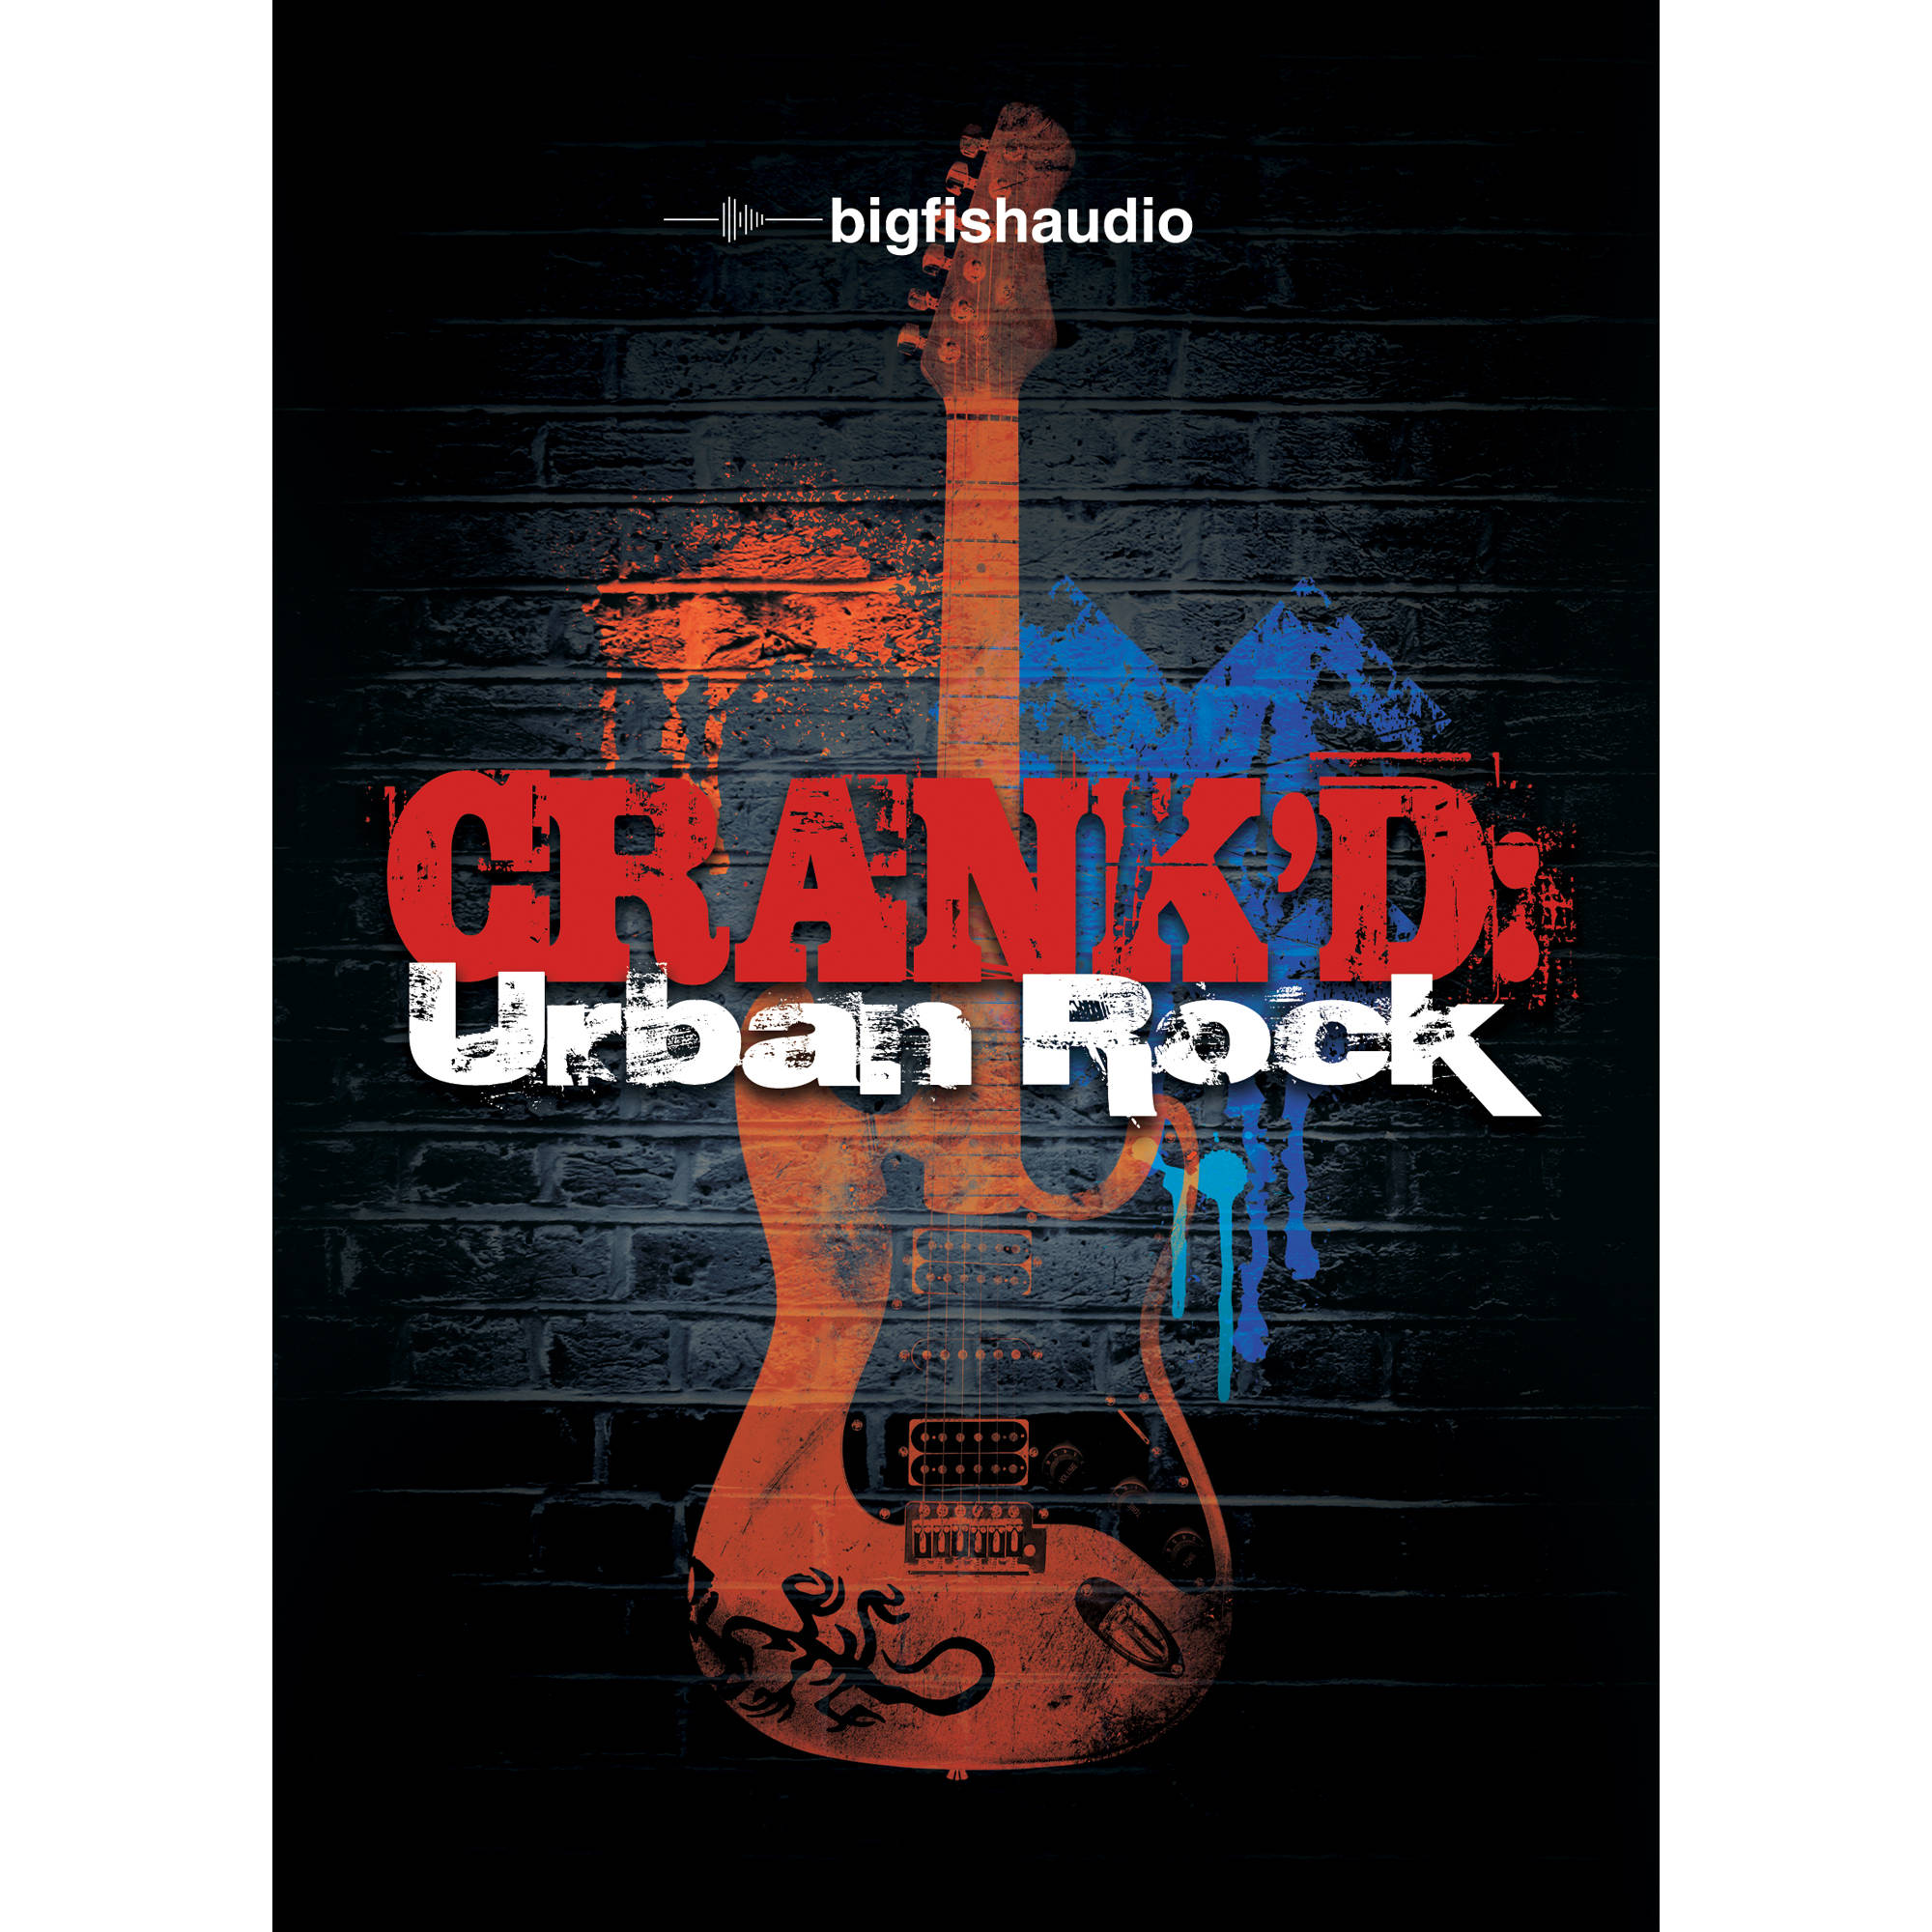 Big fish audio crank 39 d urban rock dvd crur1 orwxz b h photo for Big fish audio